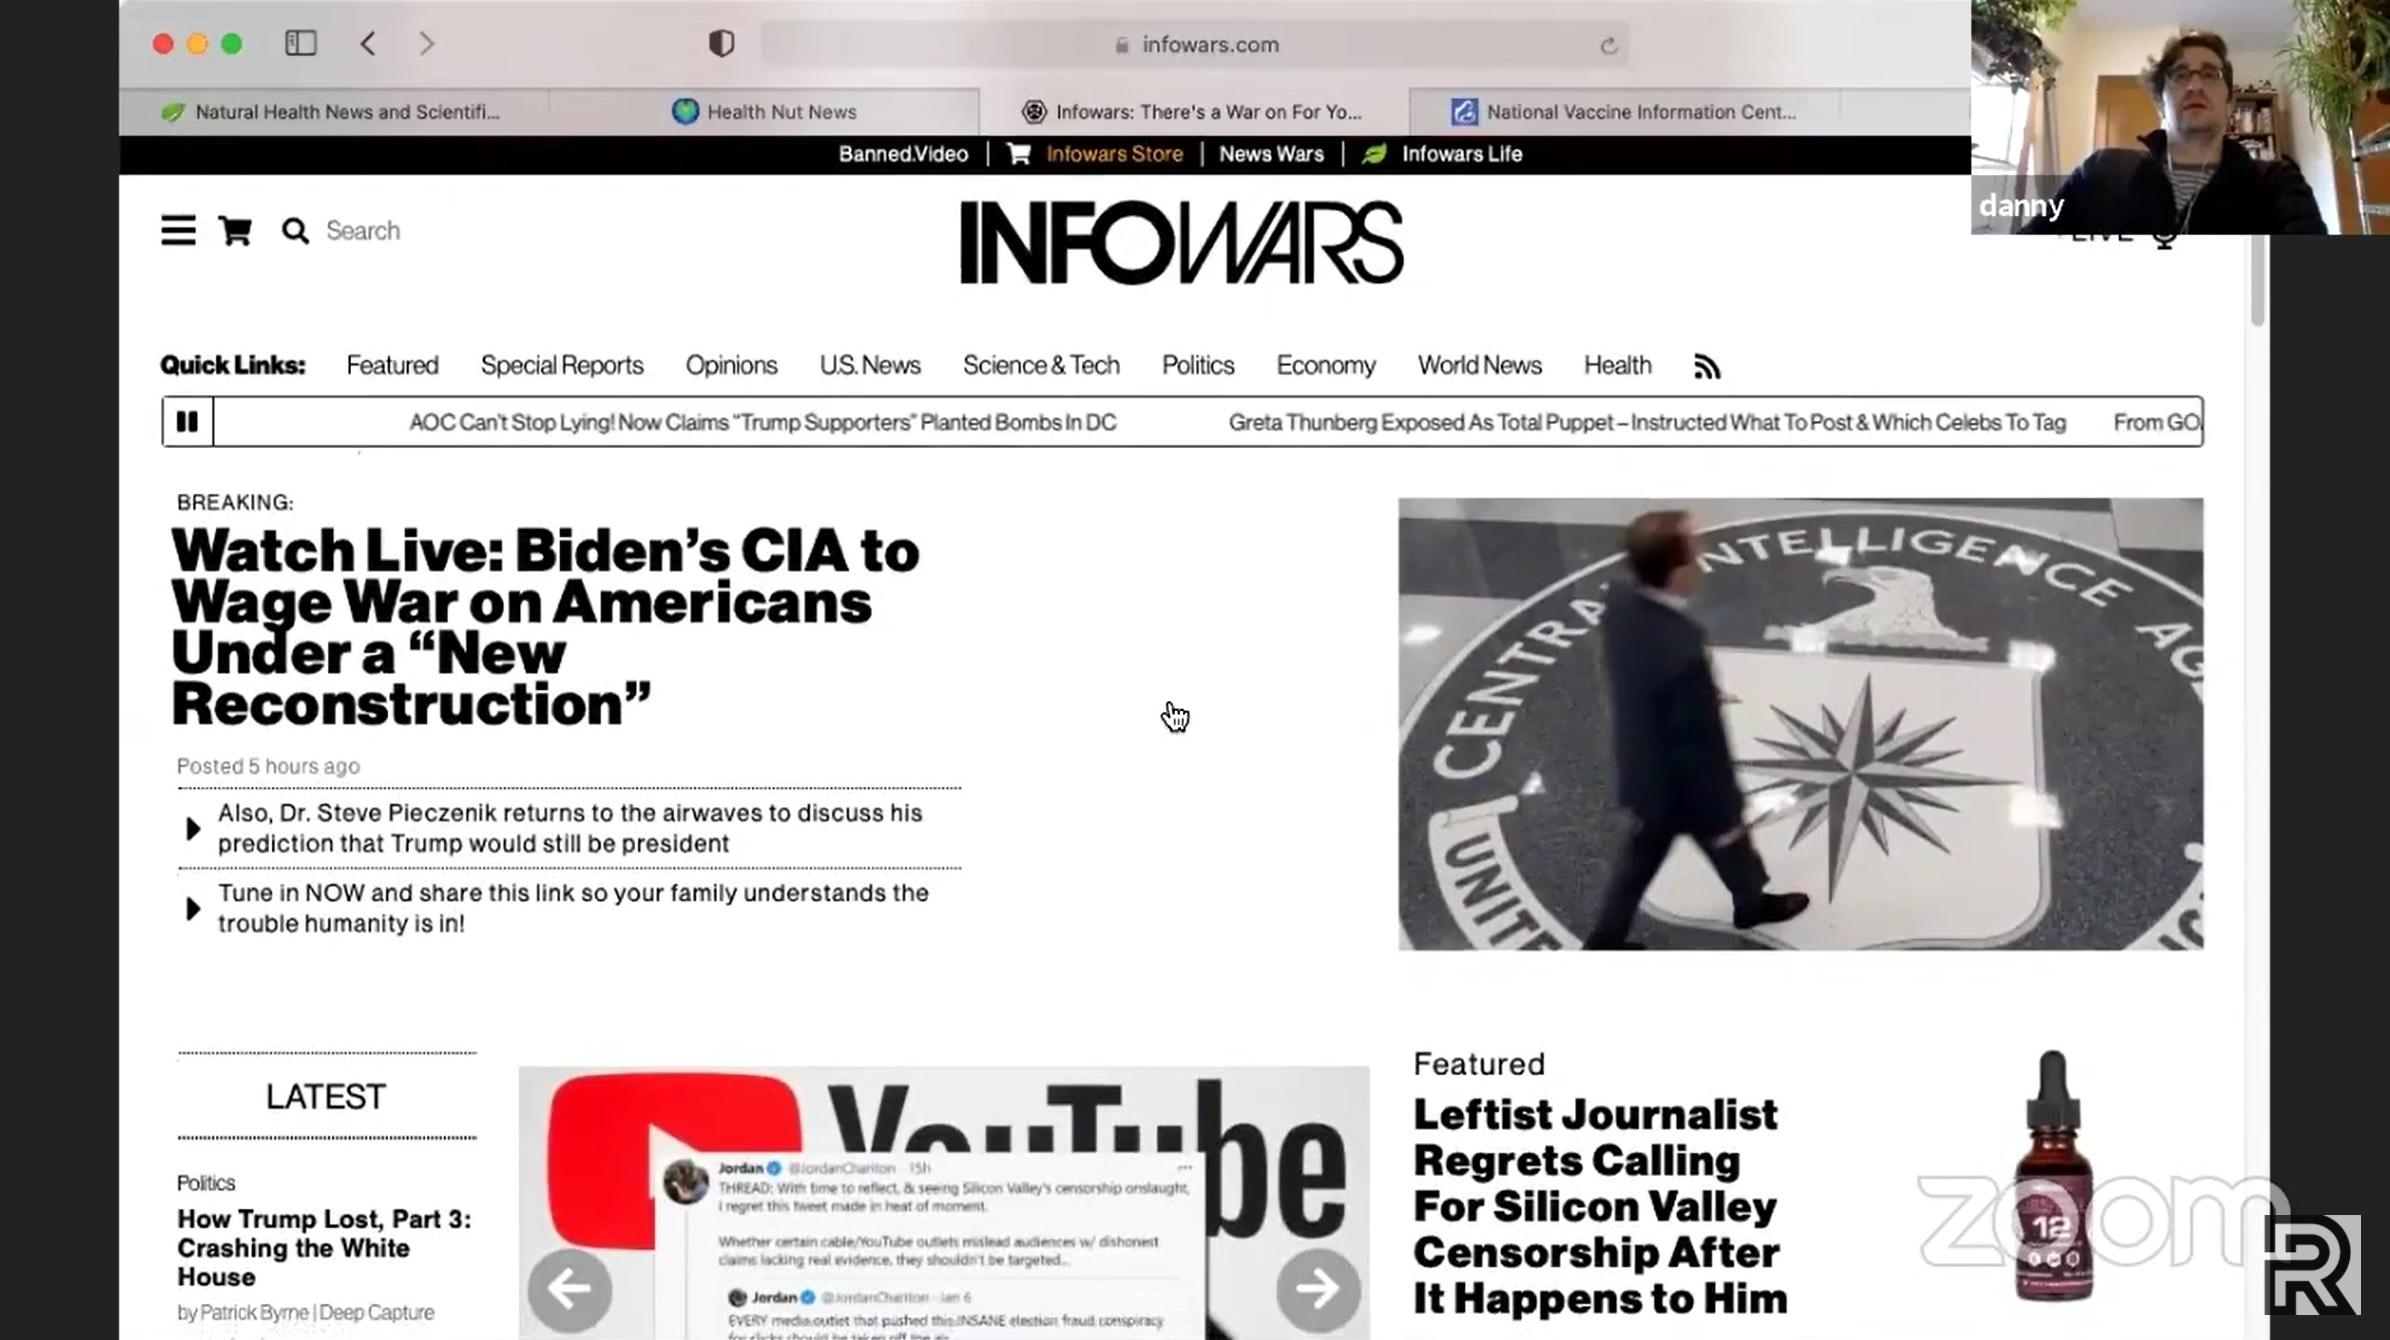 A screenshot of Infowars homepage.